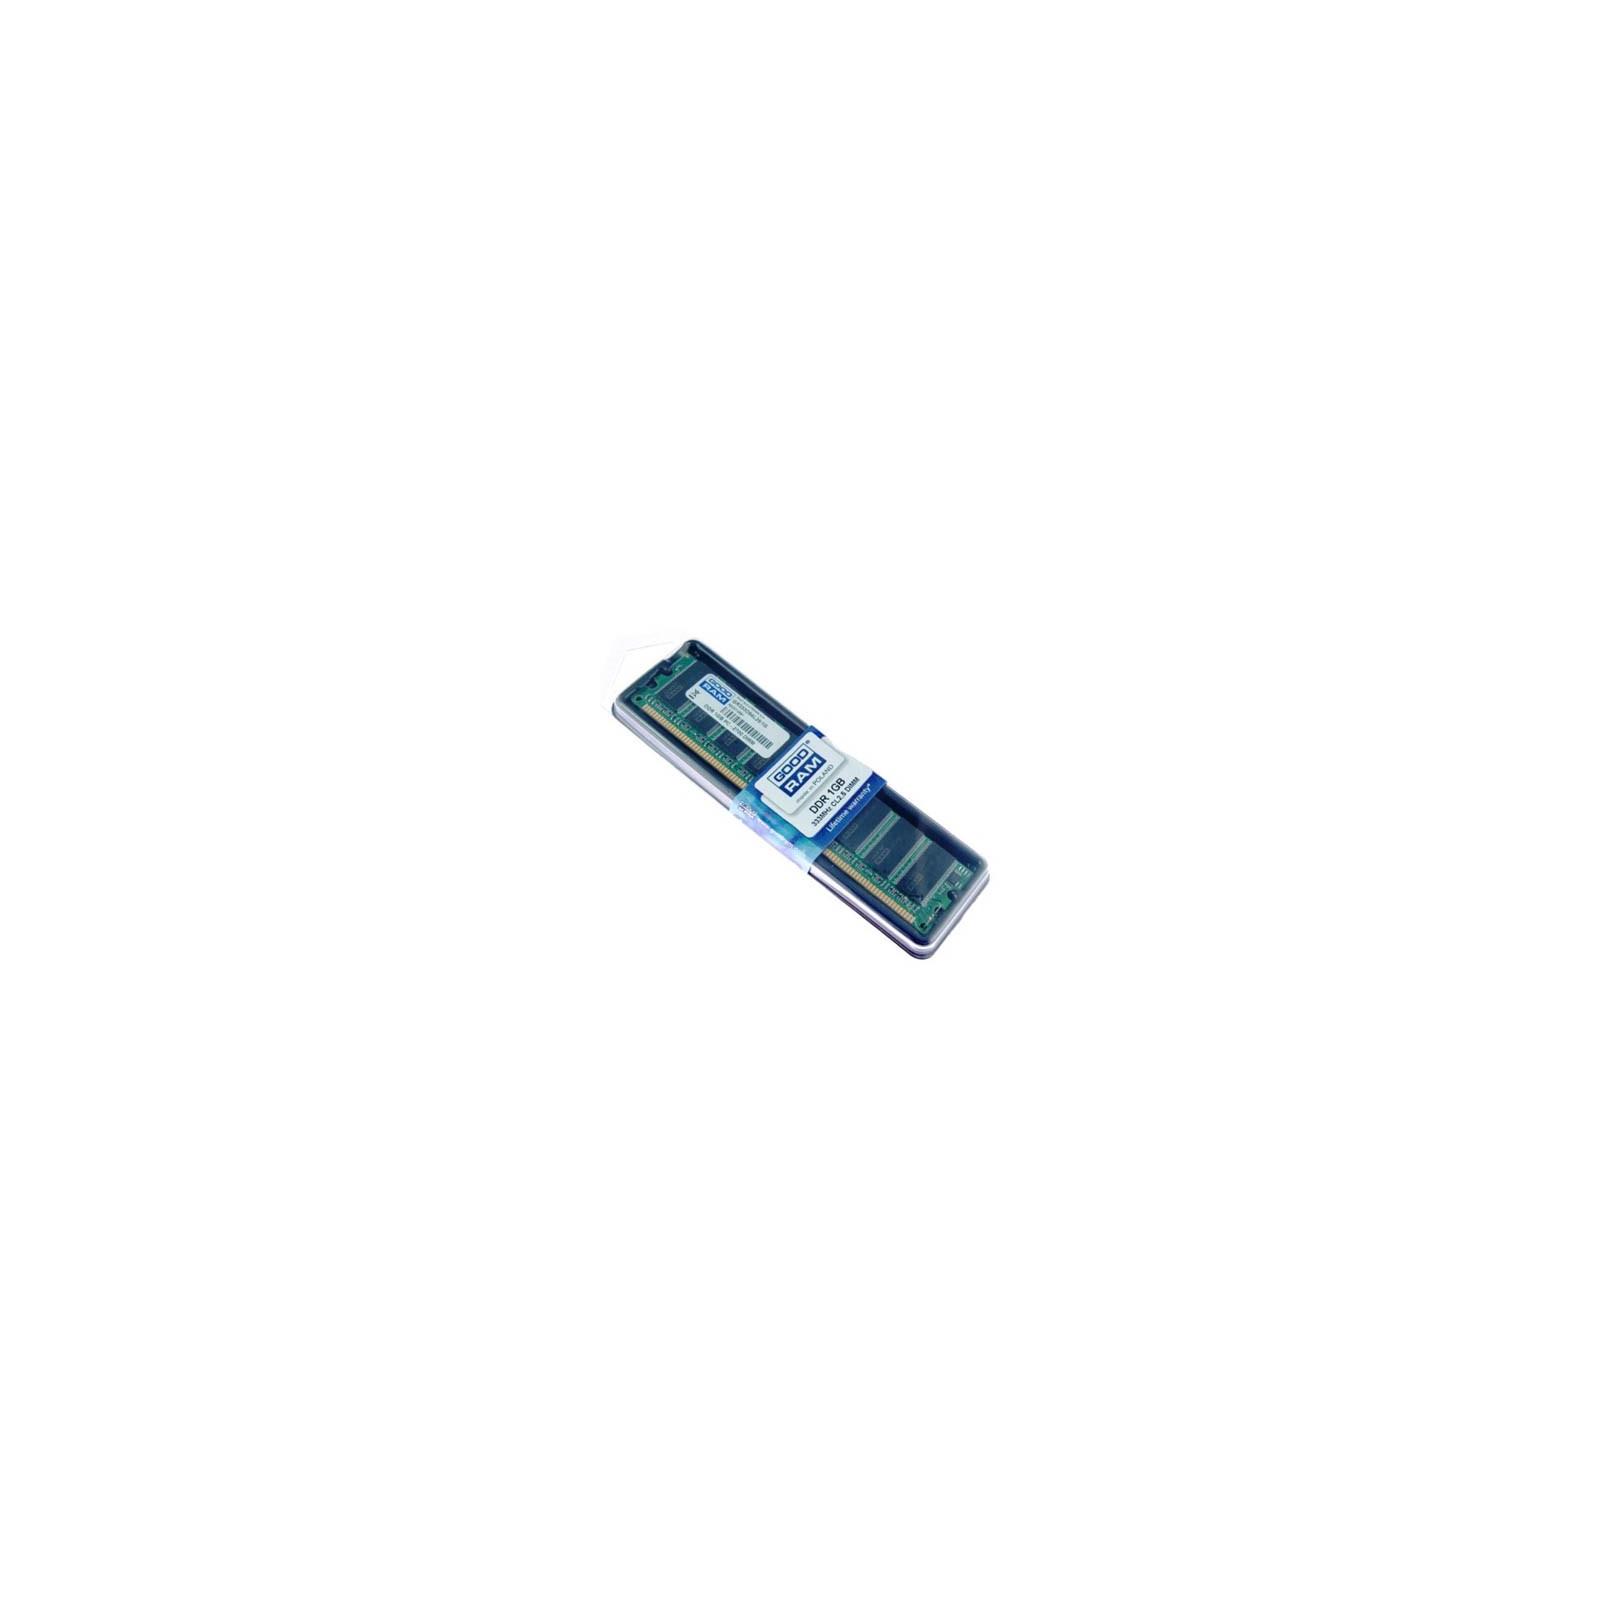 Модуль памяти для компьютера DDR SDRAM 1GB 333 MHz GOODRAM (GR333D64L25/1G)